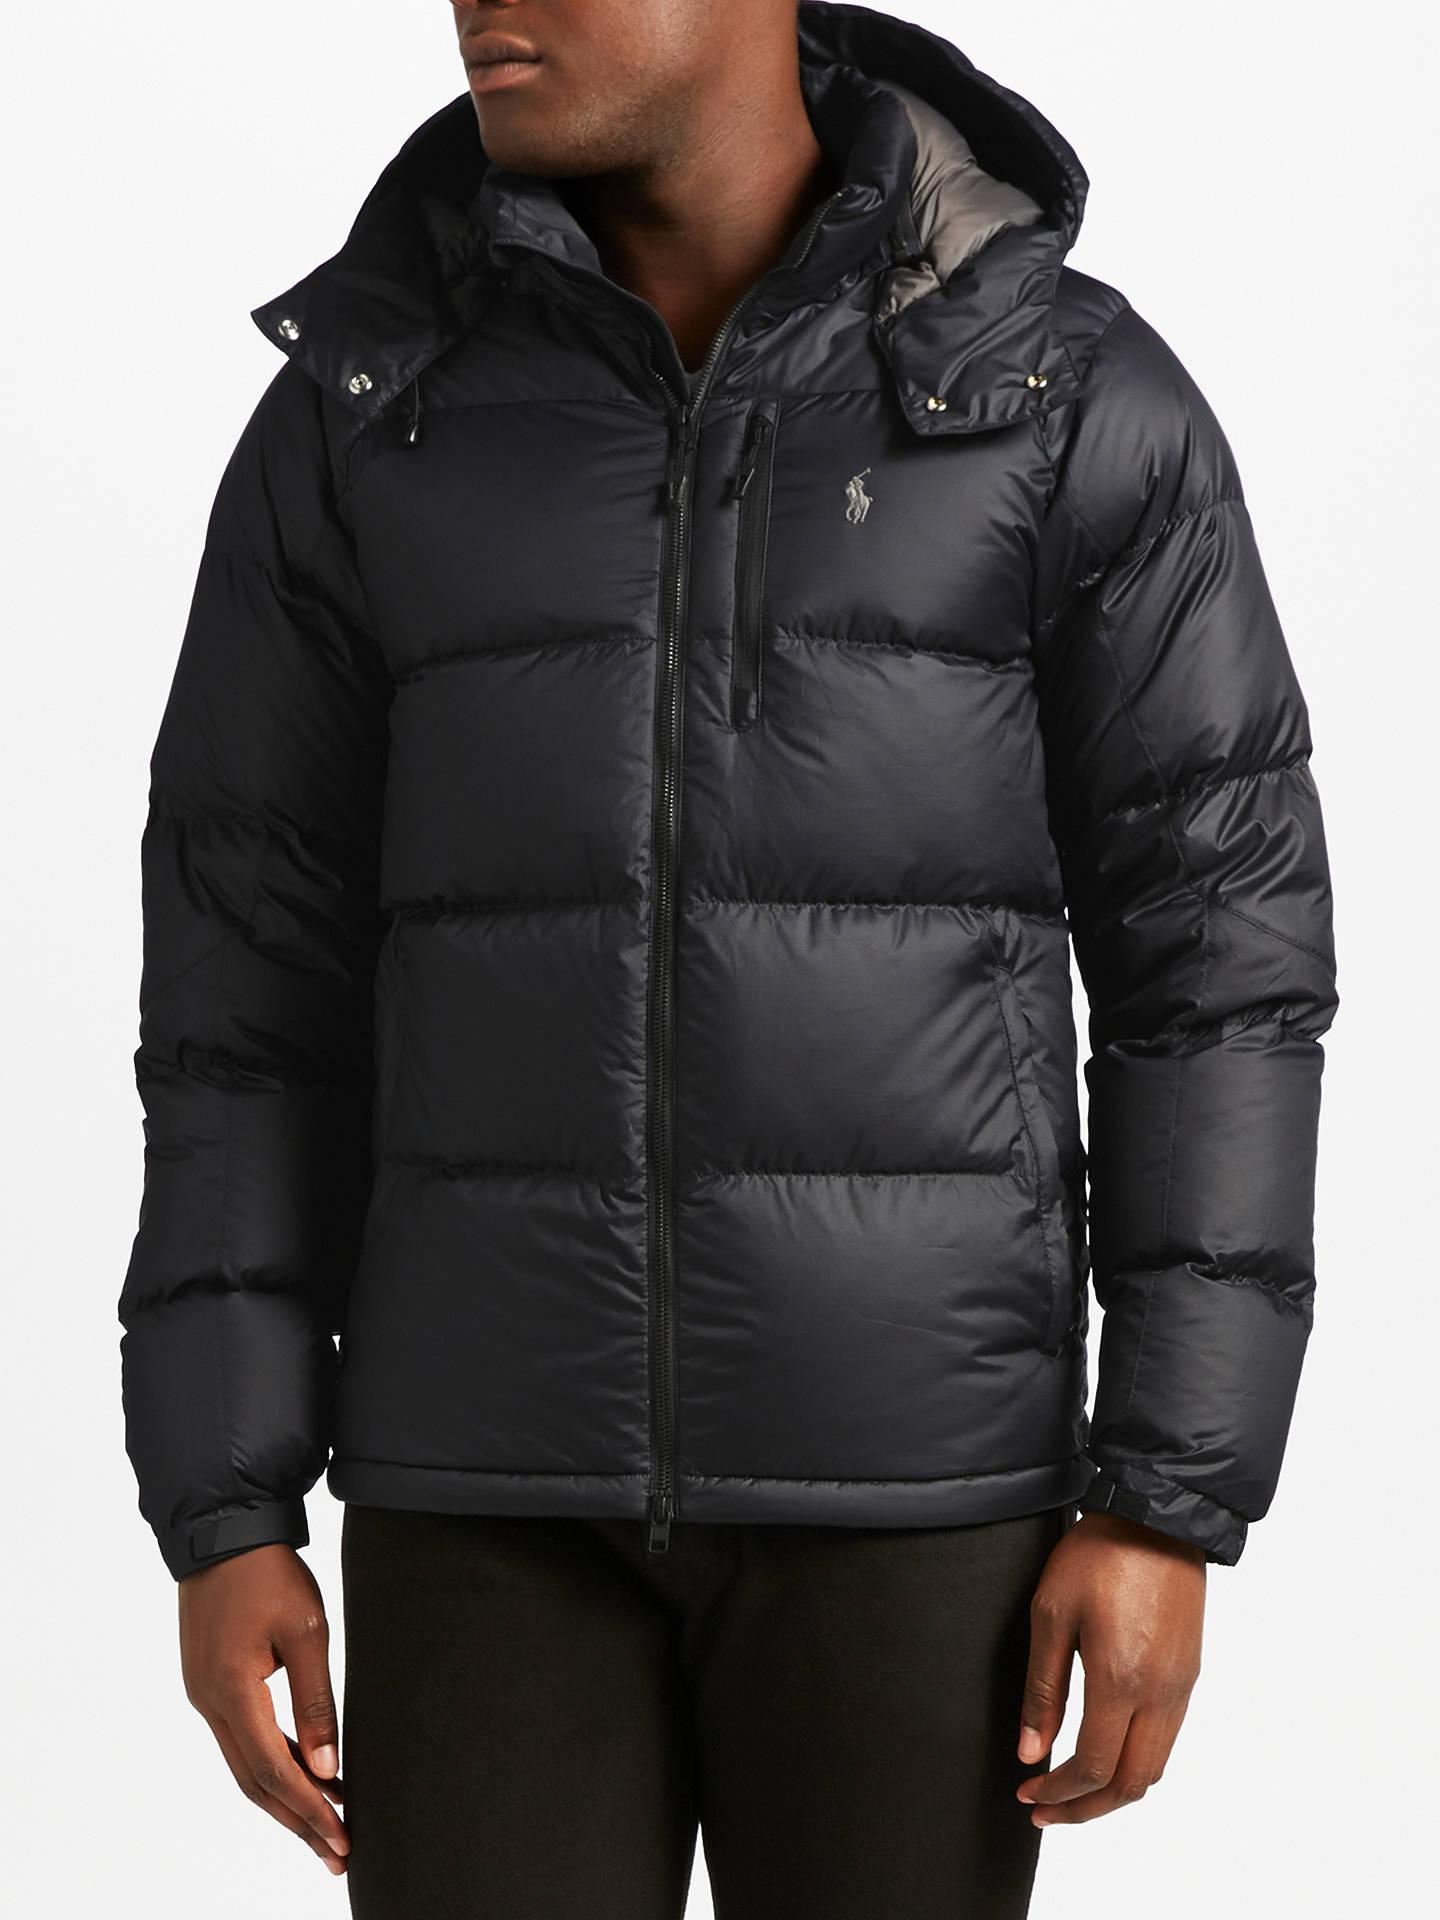 9c9594c29e2a BuyPolo Ralph Lauren Padded Jacket, Polo Black, XXL Online at johnlewis.com  ...